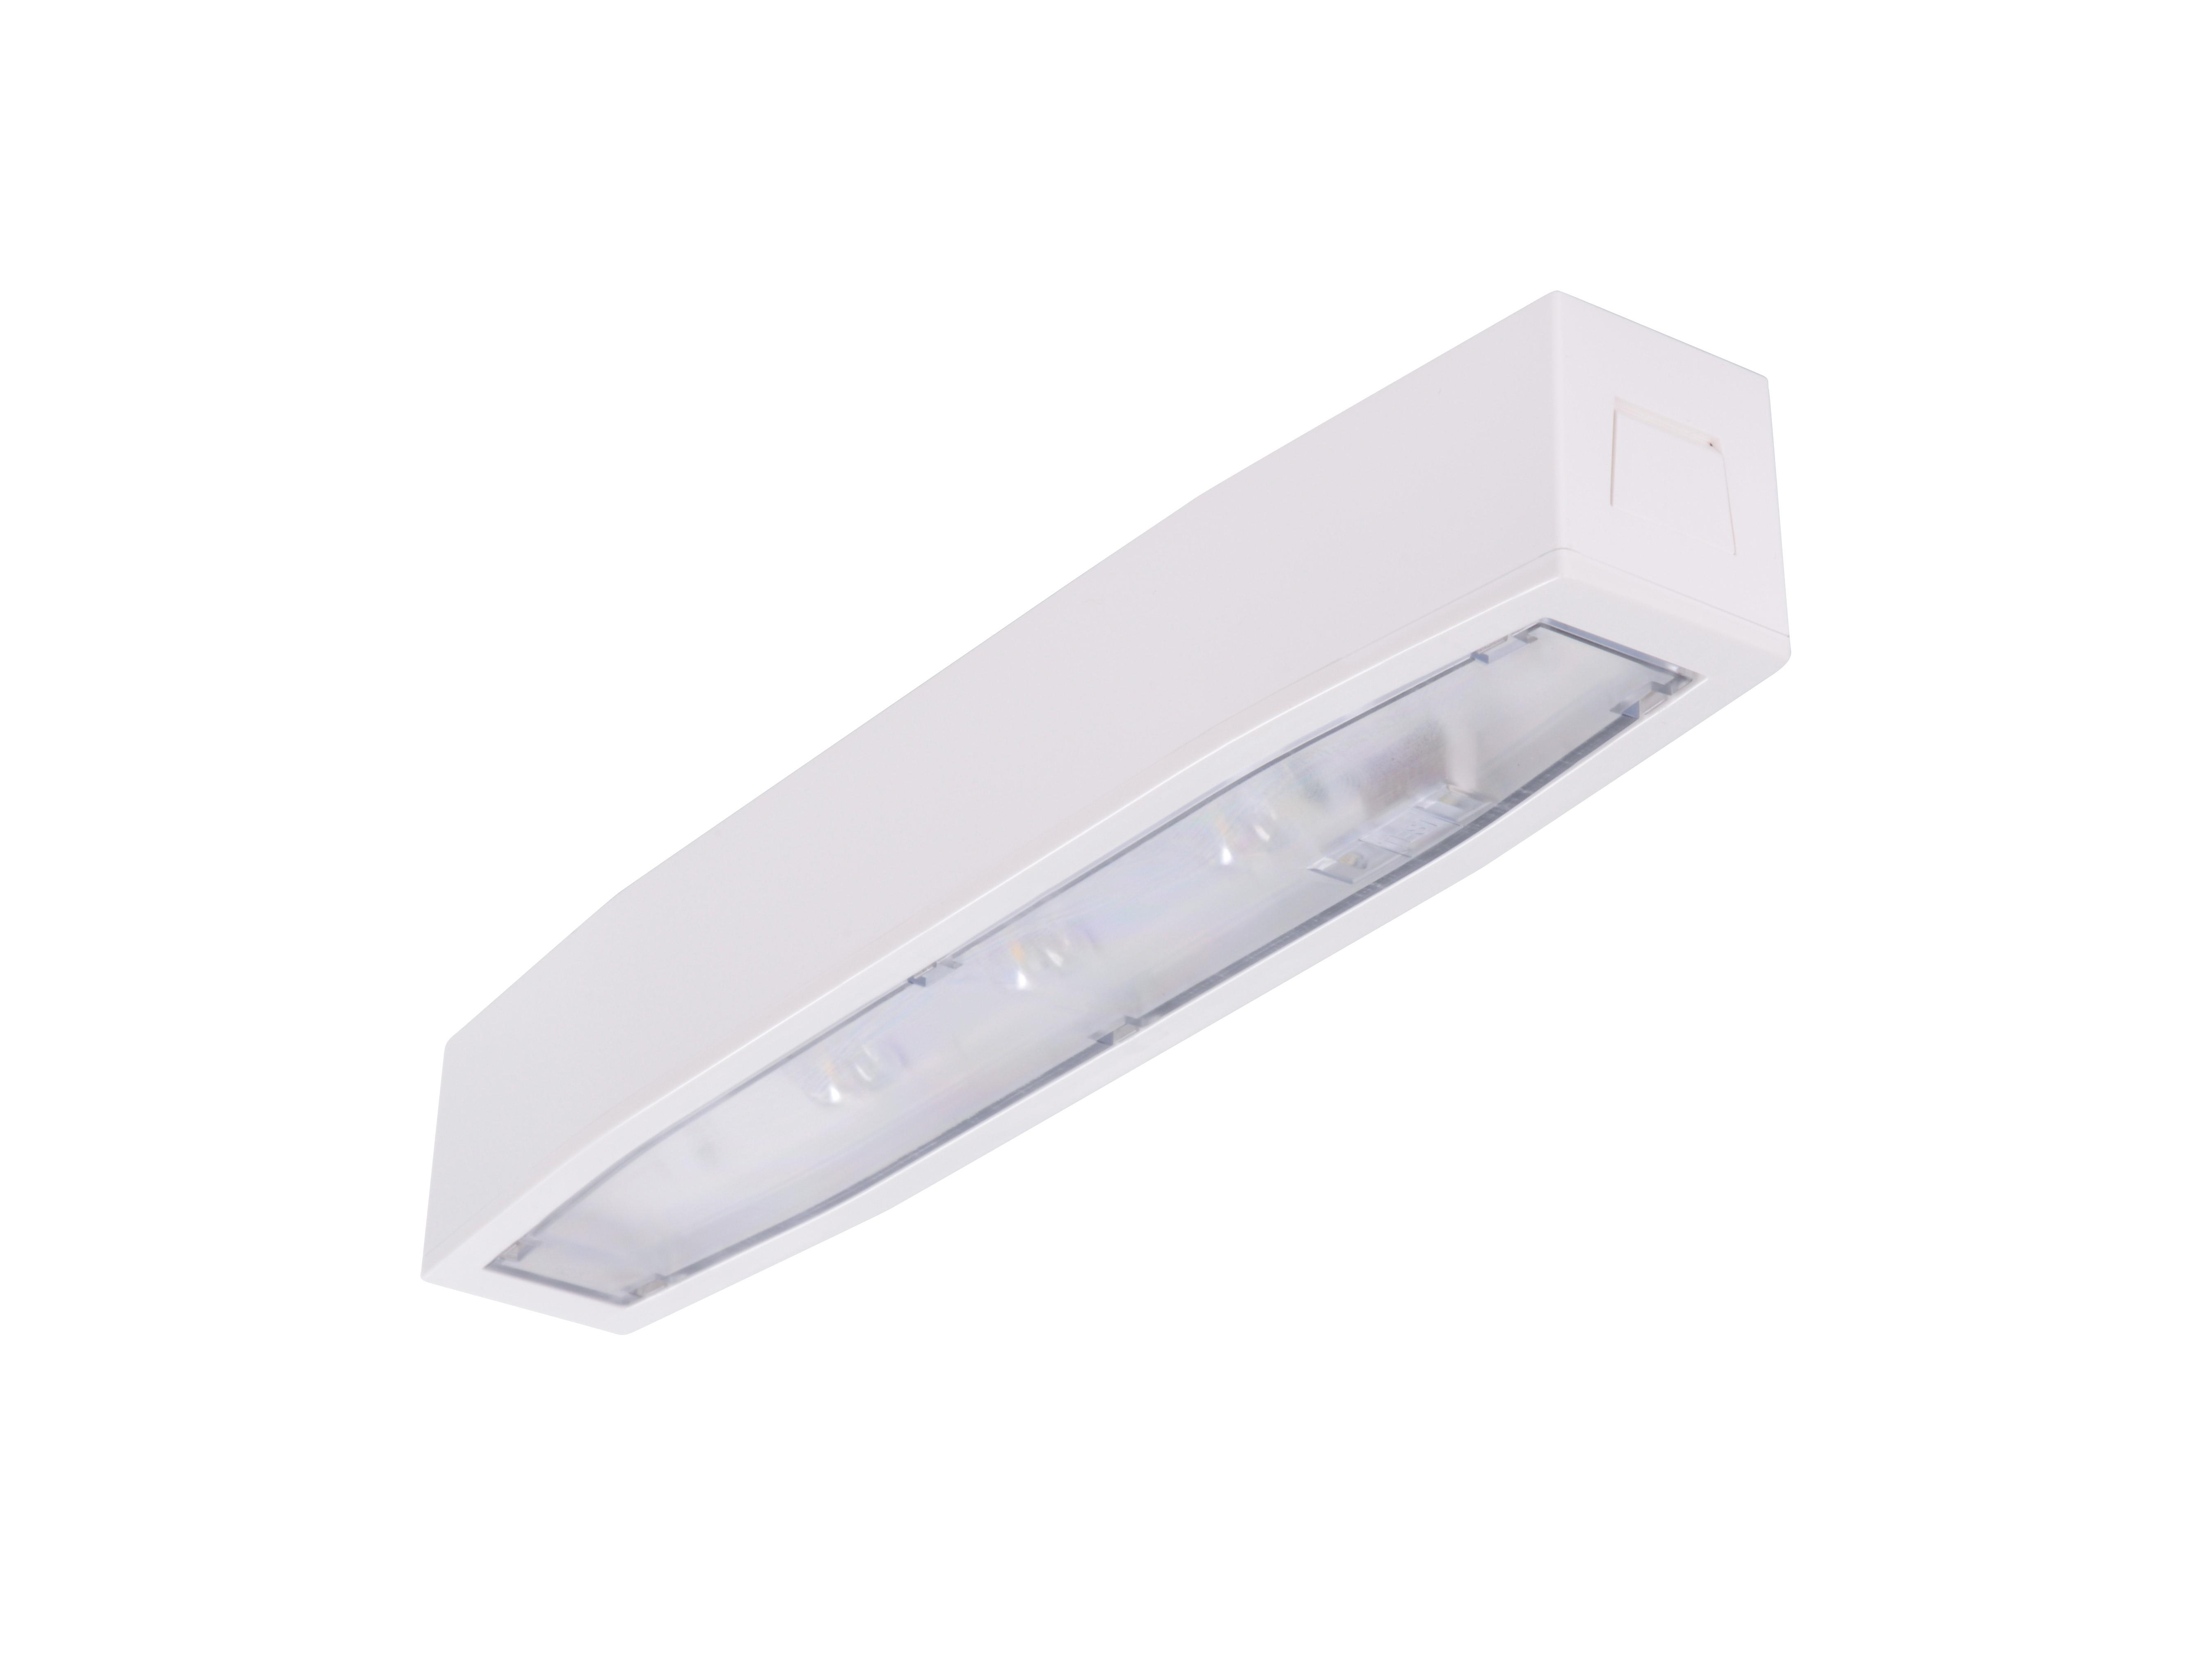 Lampa emergenta led Intelight 94767   3h nementinut test automat0